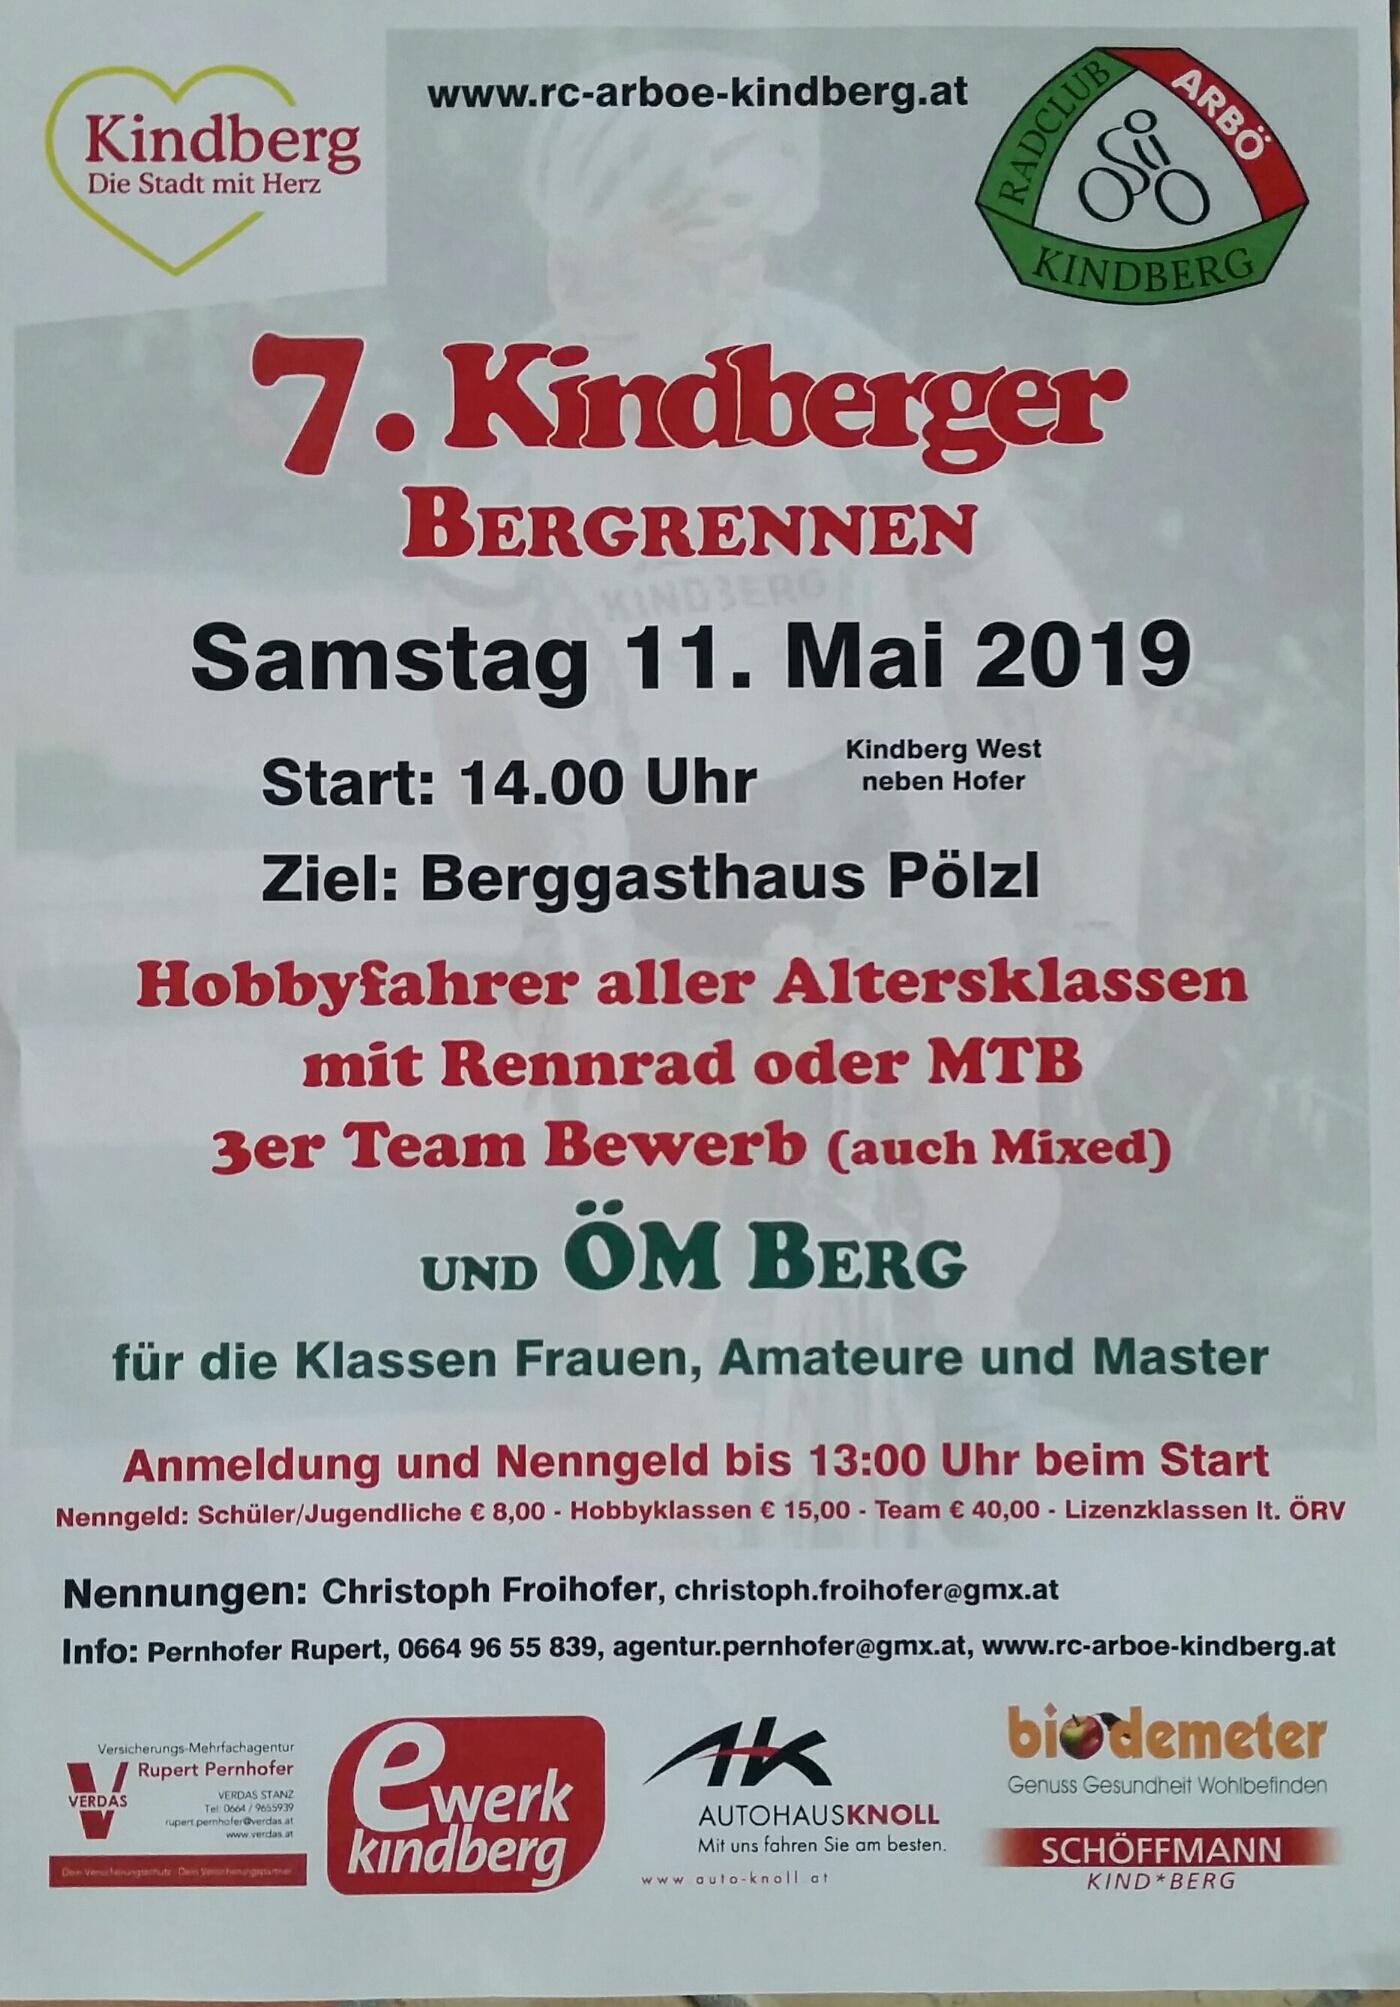 Plakat Kdbg Bergrennen